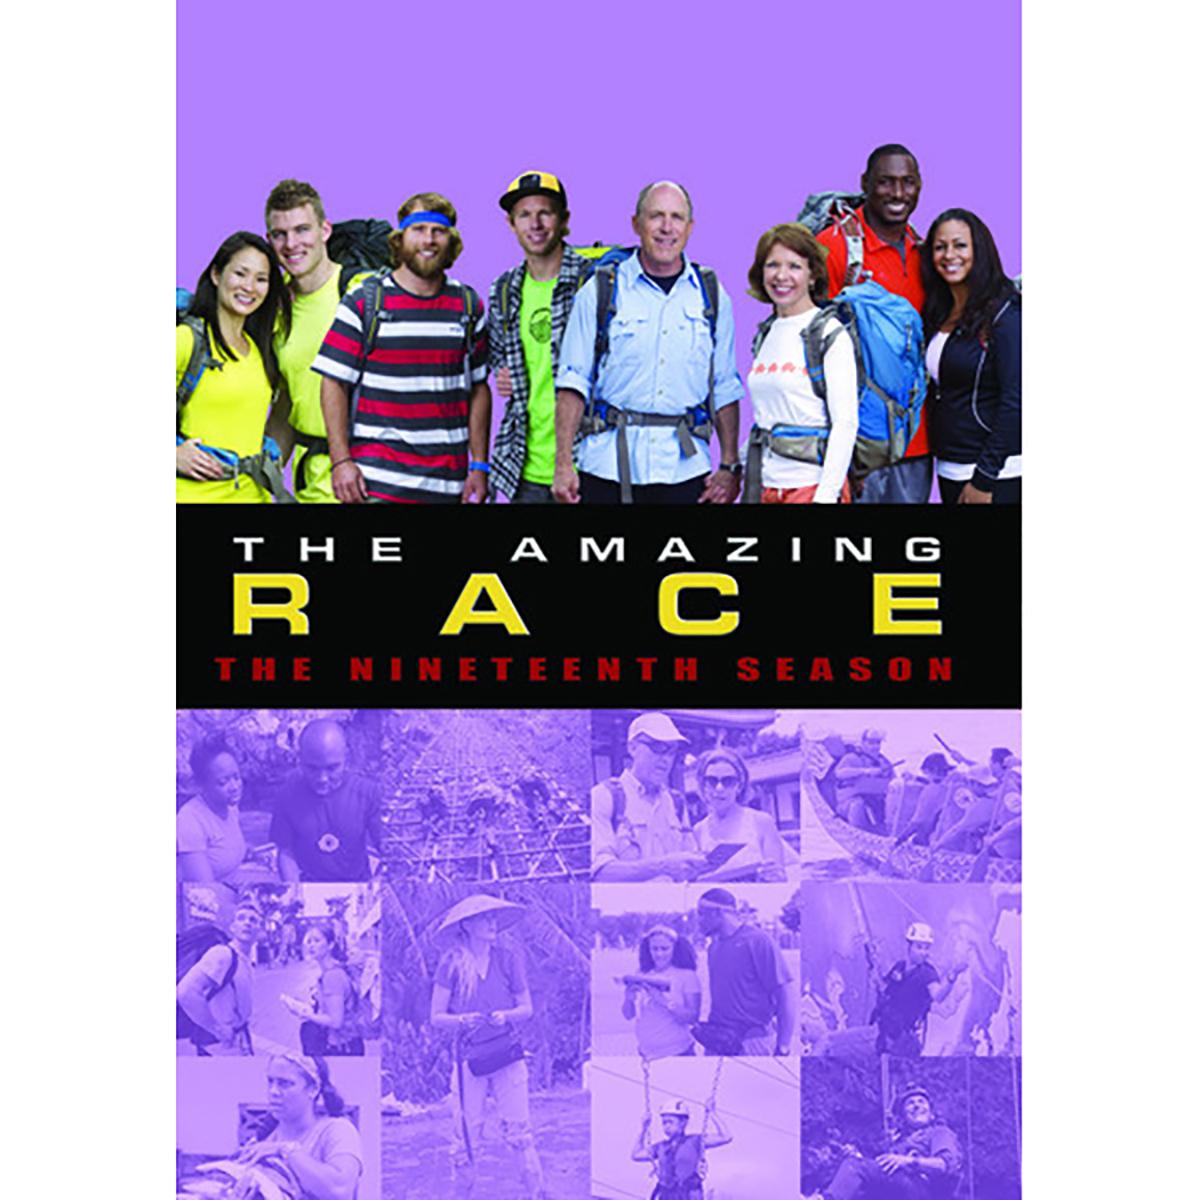 The Amazing Race: Season 19 DVD